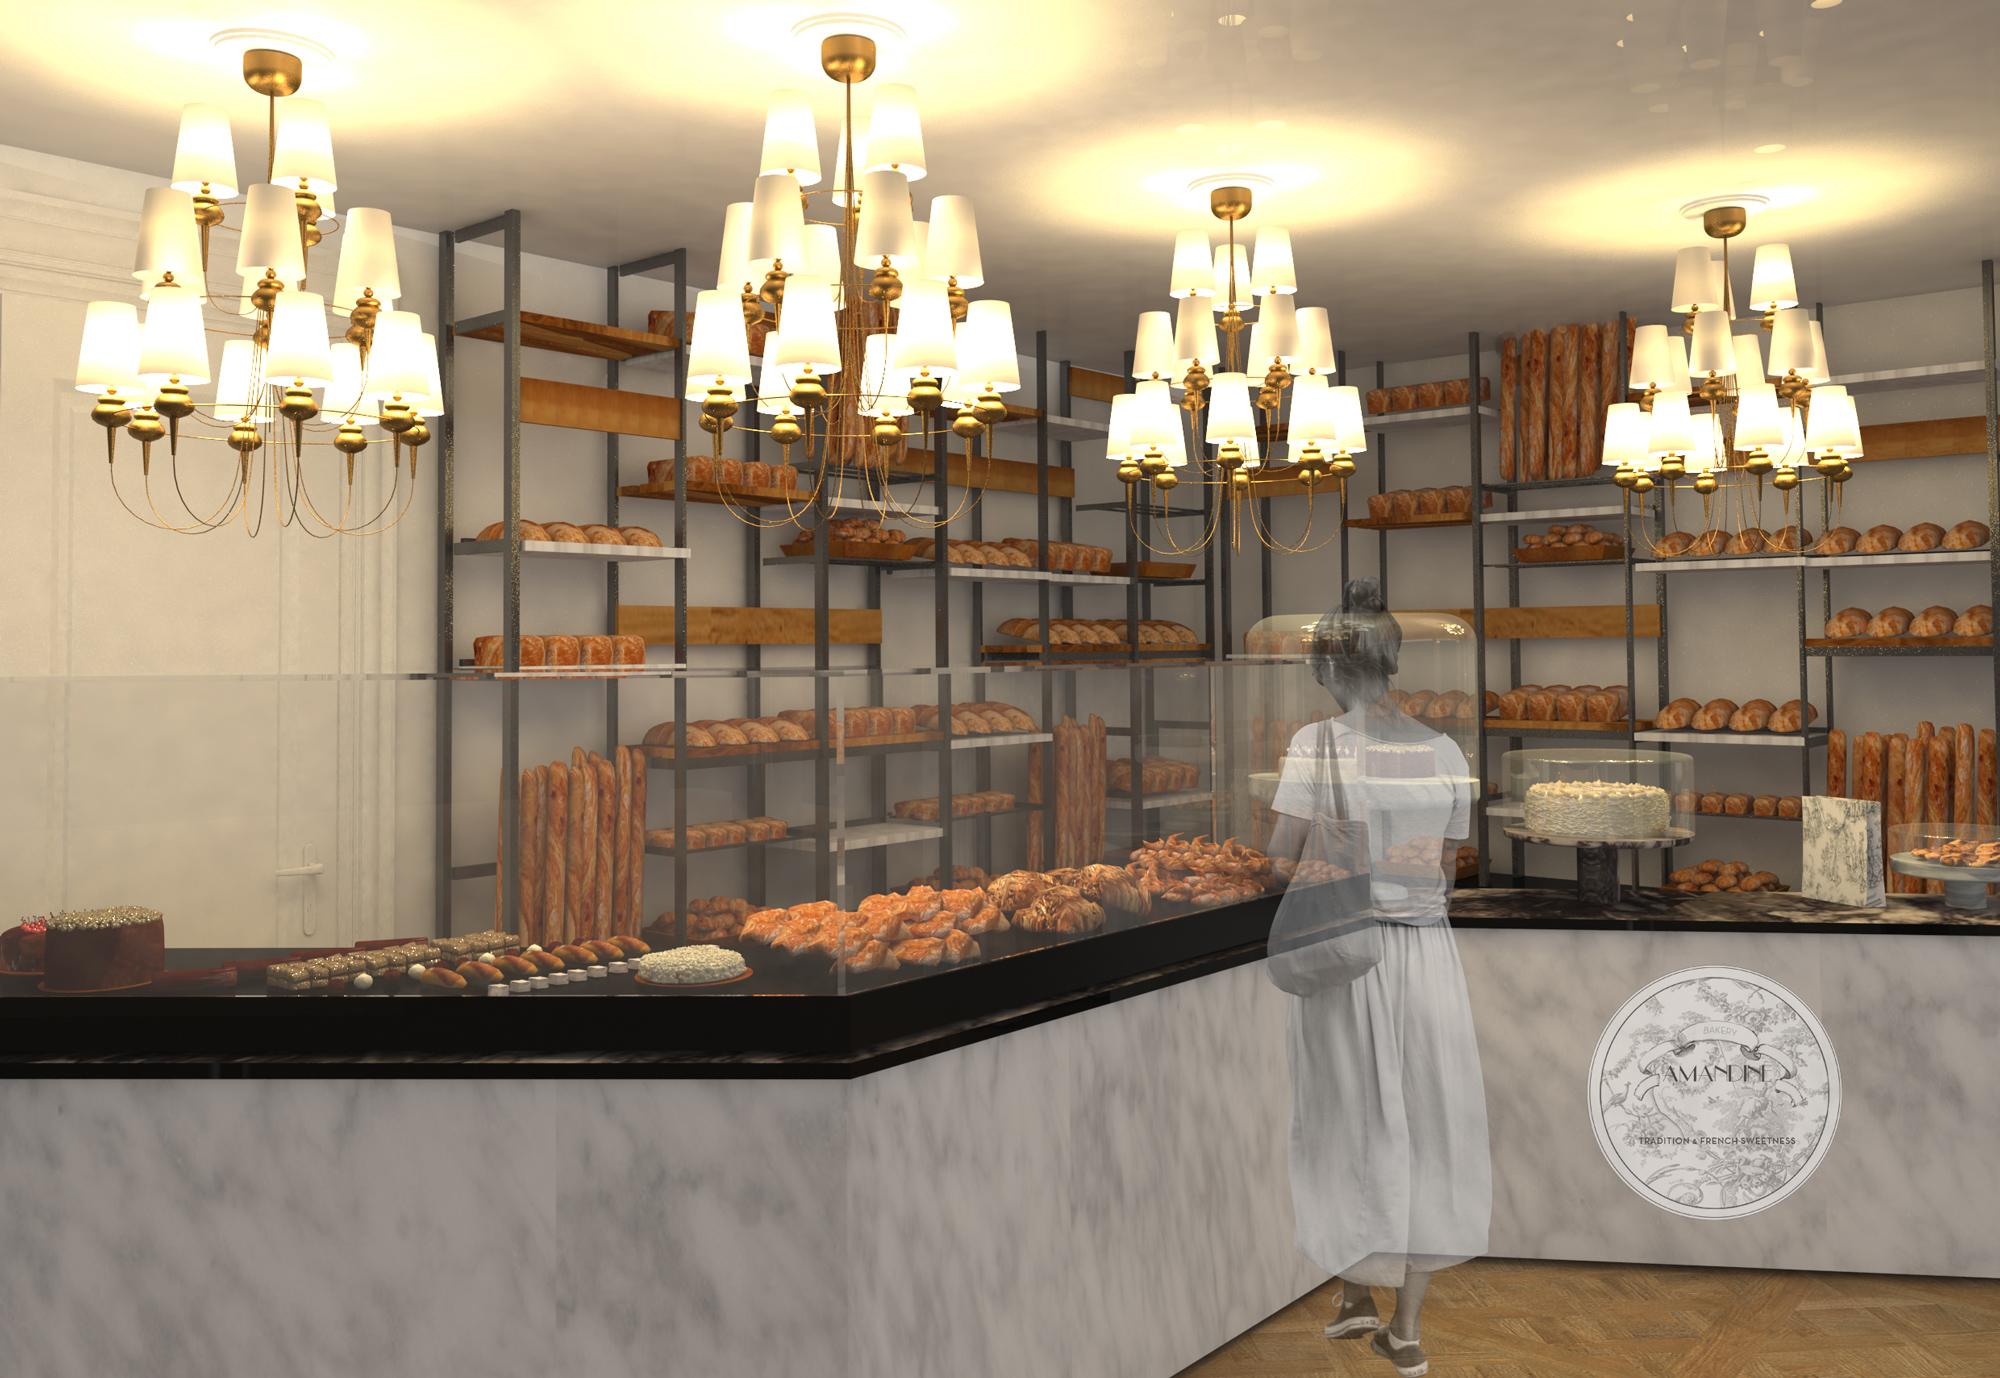 amandine-vue-boulangerie